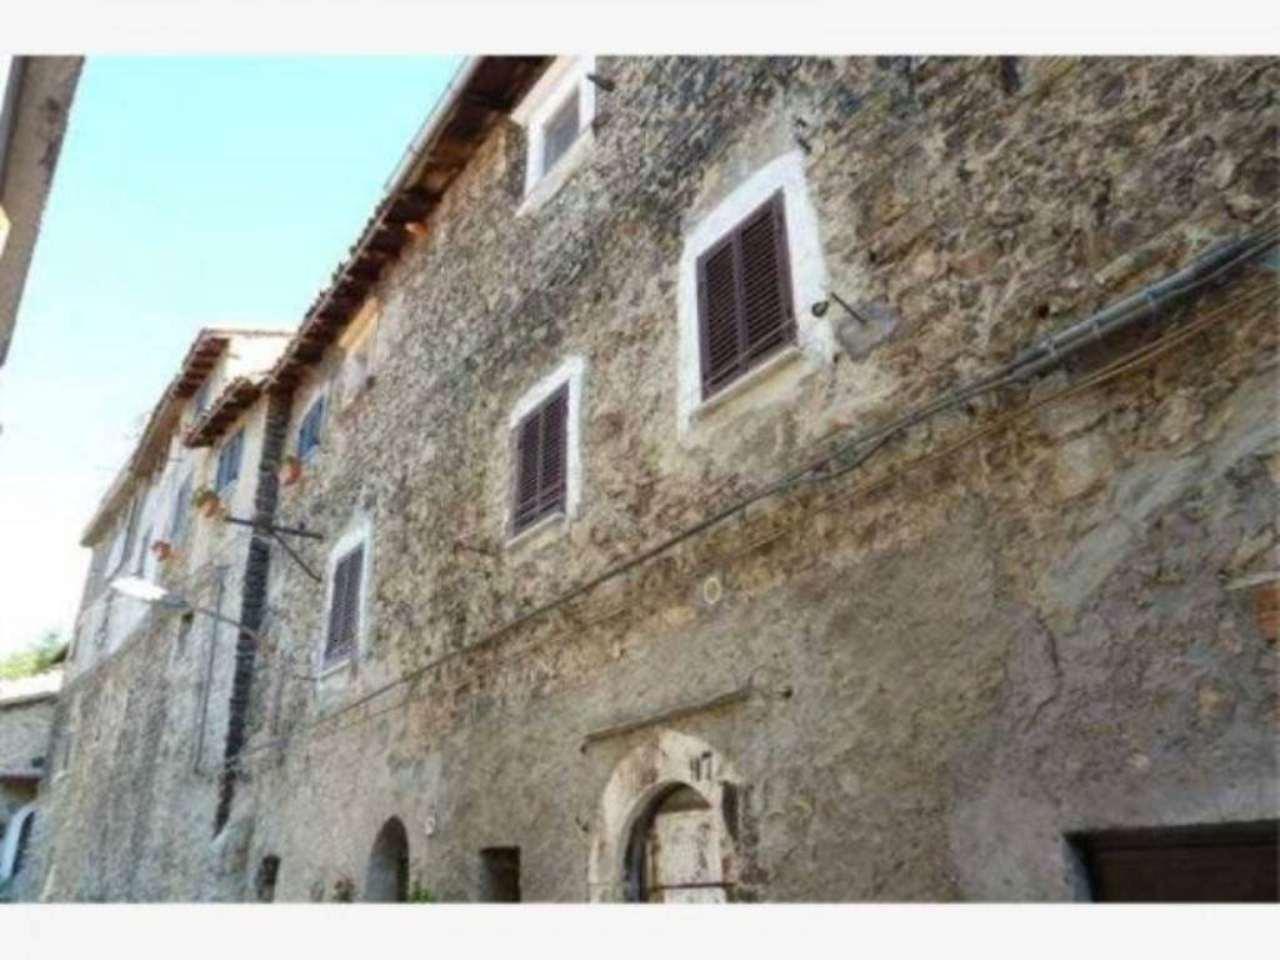 Bilocale Carsoli Via San Nicola 72 2